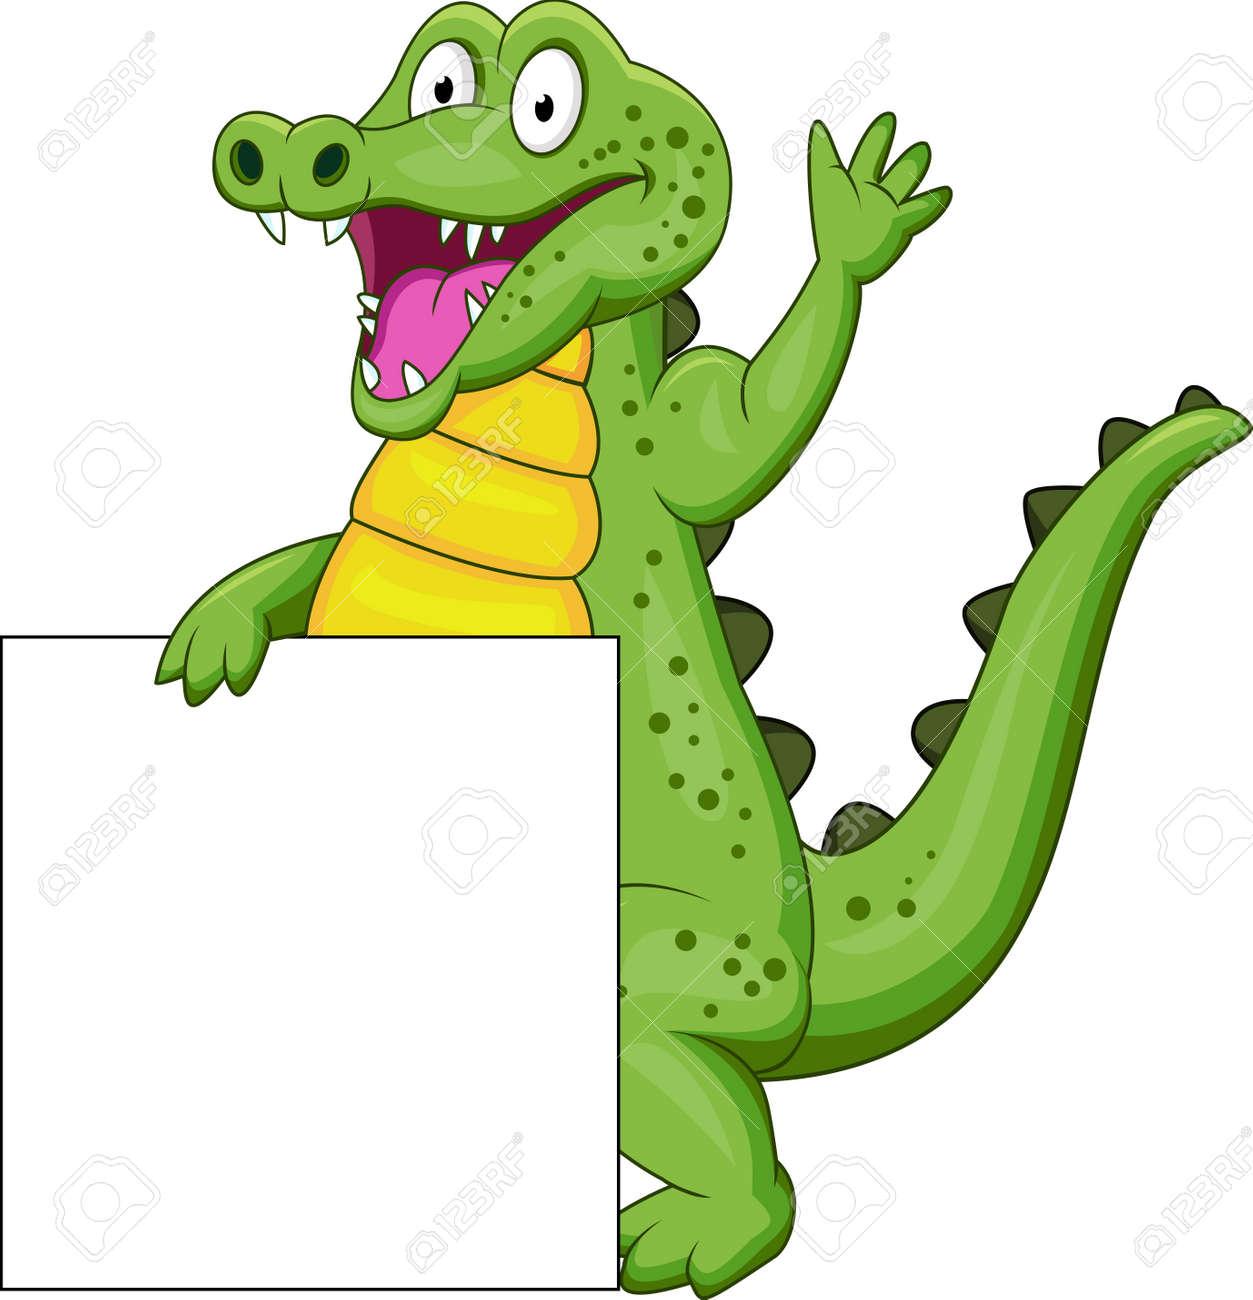 crocodile with blank sign Stock Vector - 13496453